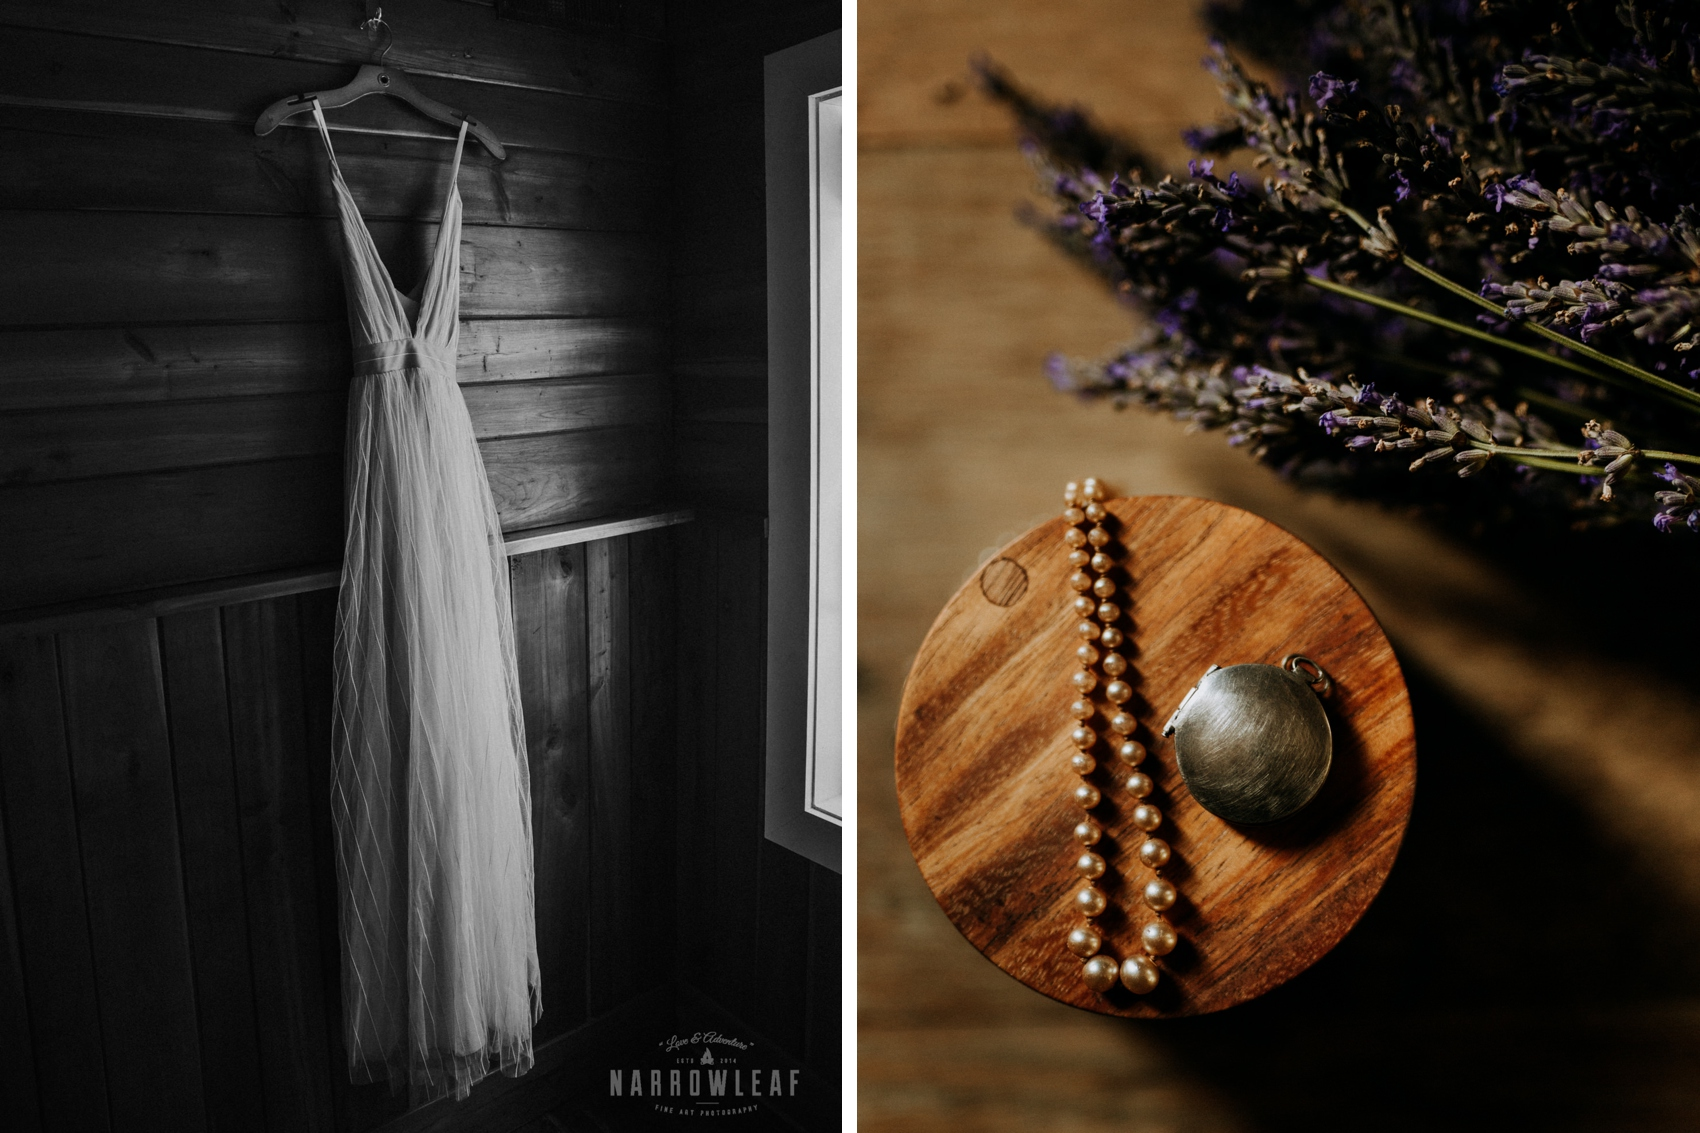 wisconsin-wedding-photographer-woodsy-narrowleaf-photography001-002.jpg